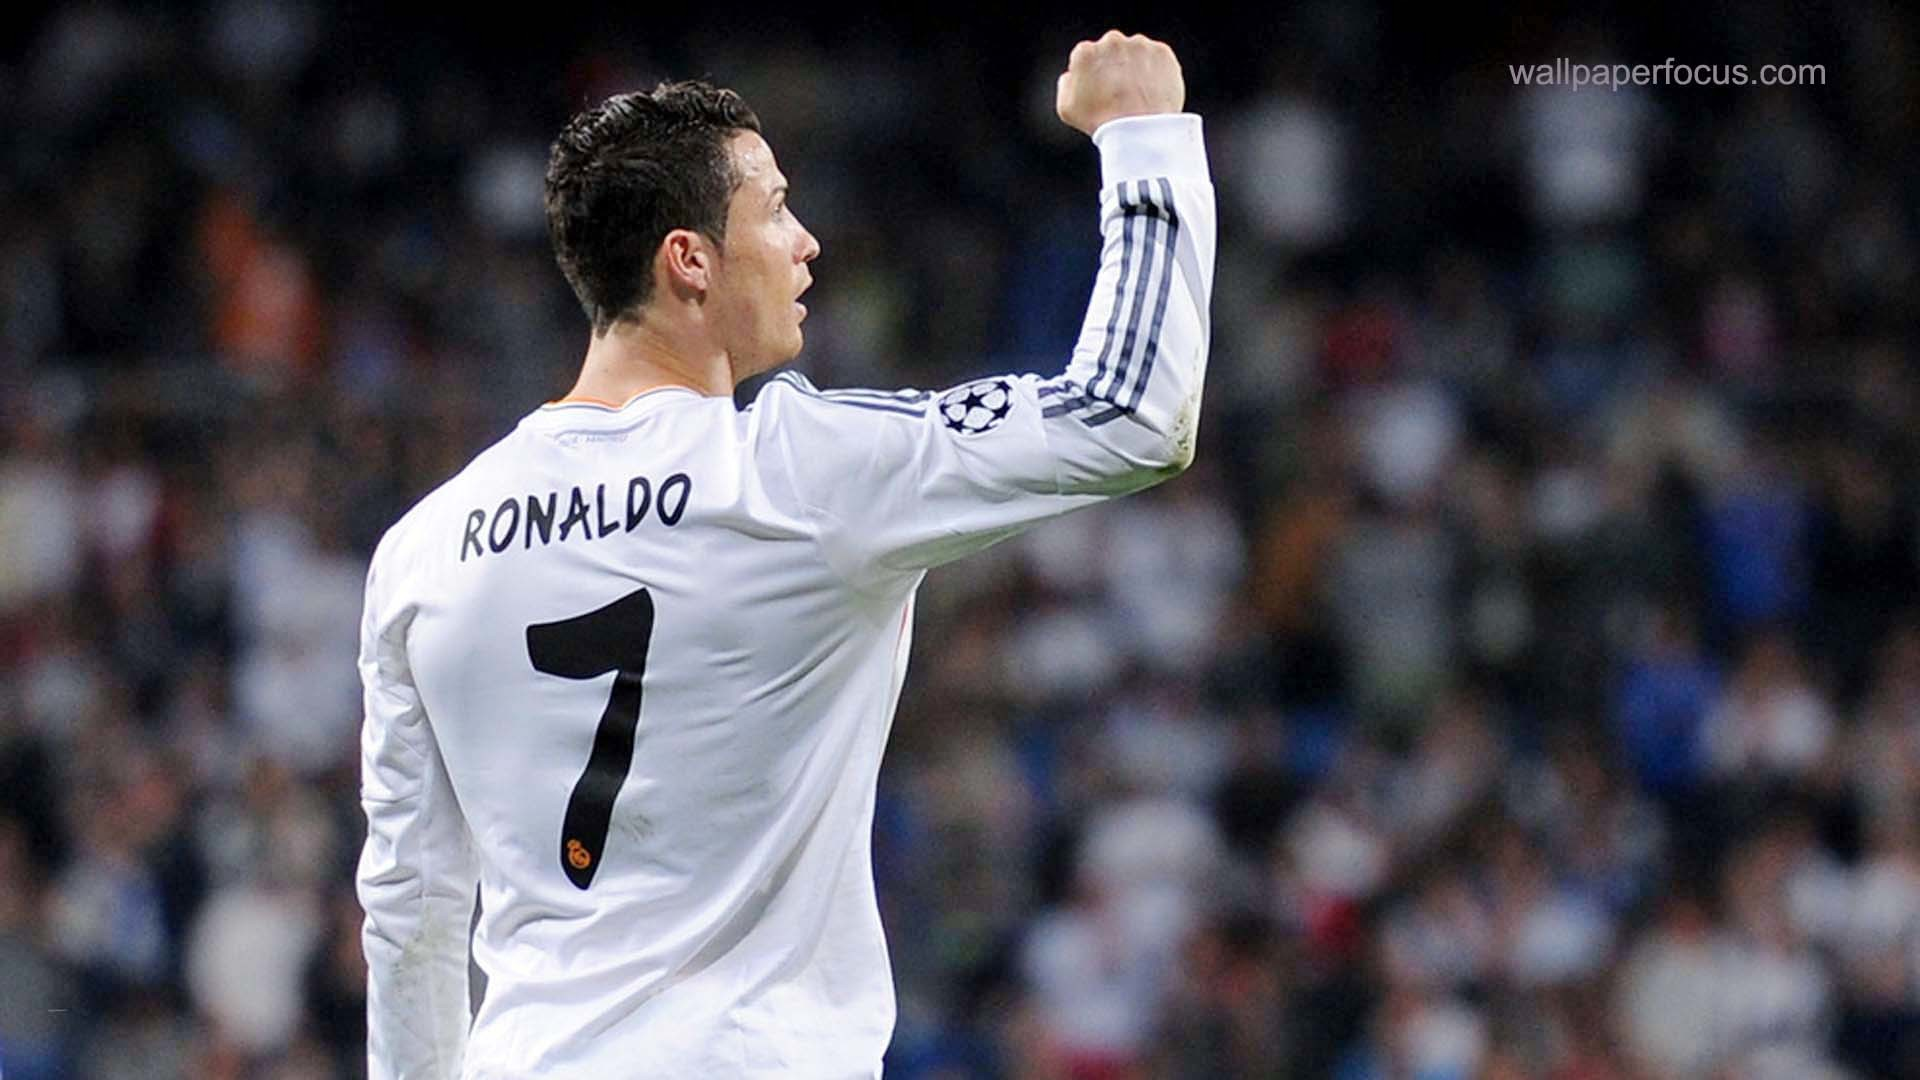 Cristiano Ronaldo wallpaper and Theme for Windows Xp/7/8.1/10 .